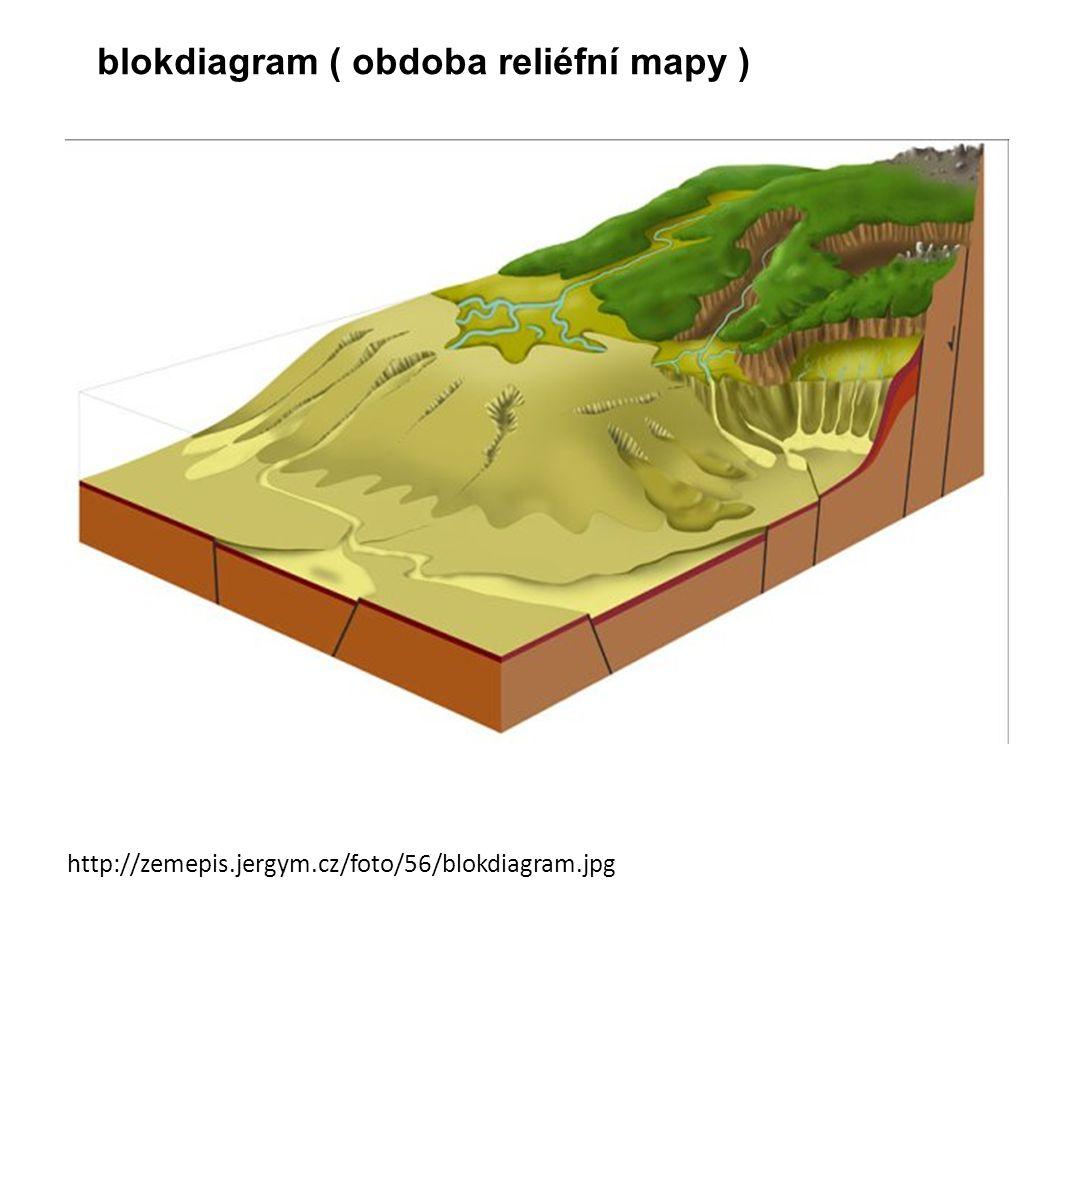 blokdiagram ( obdoba reliéfní mapy ) http://zemepis.jergym.cz/foto/56/blokdiagram.jpg